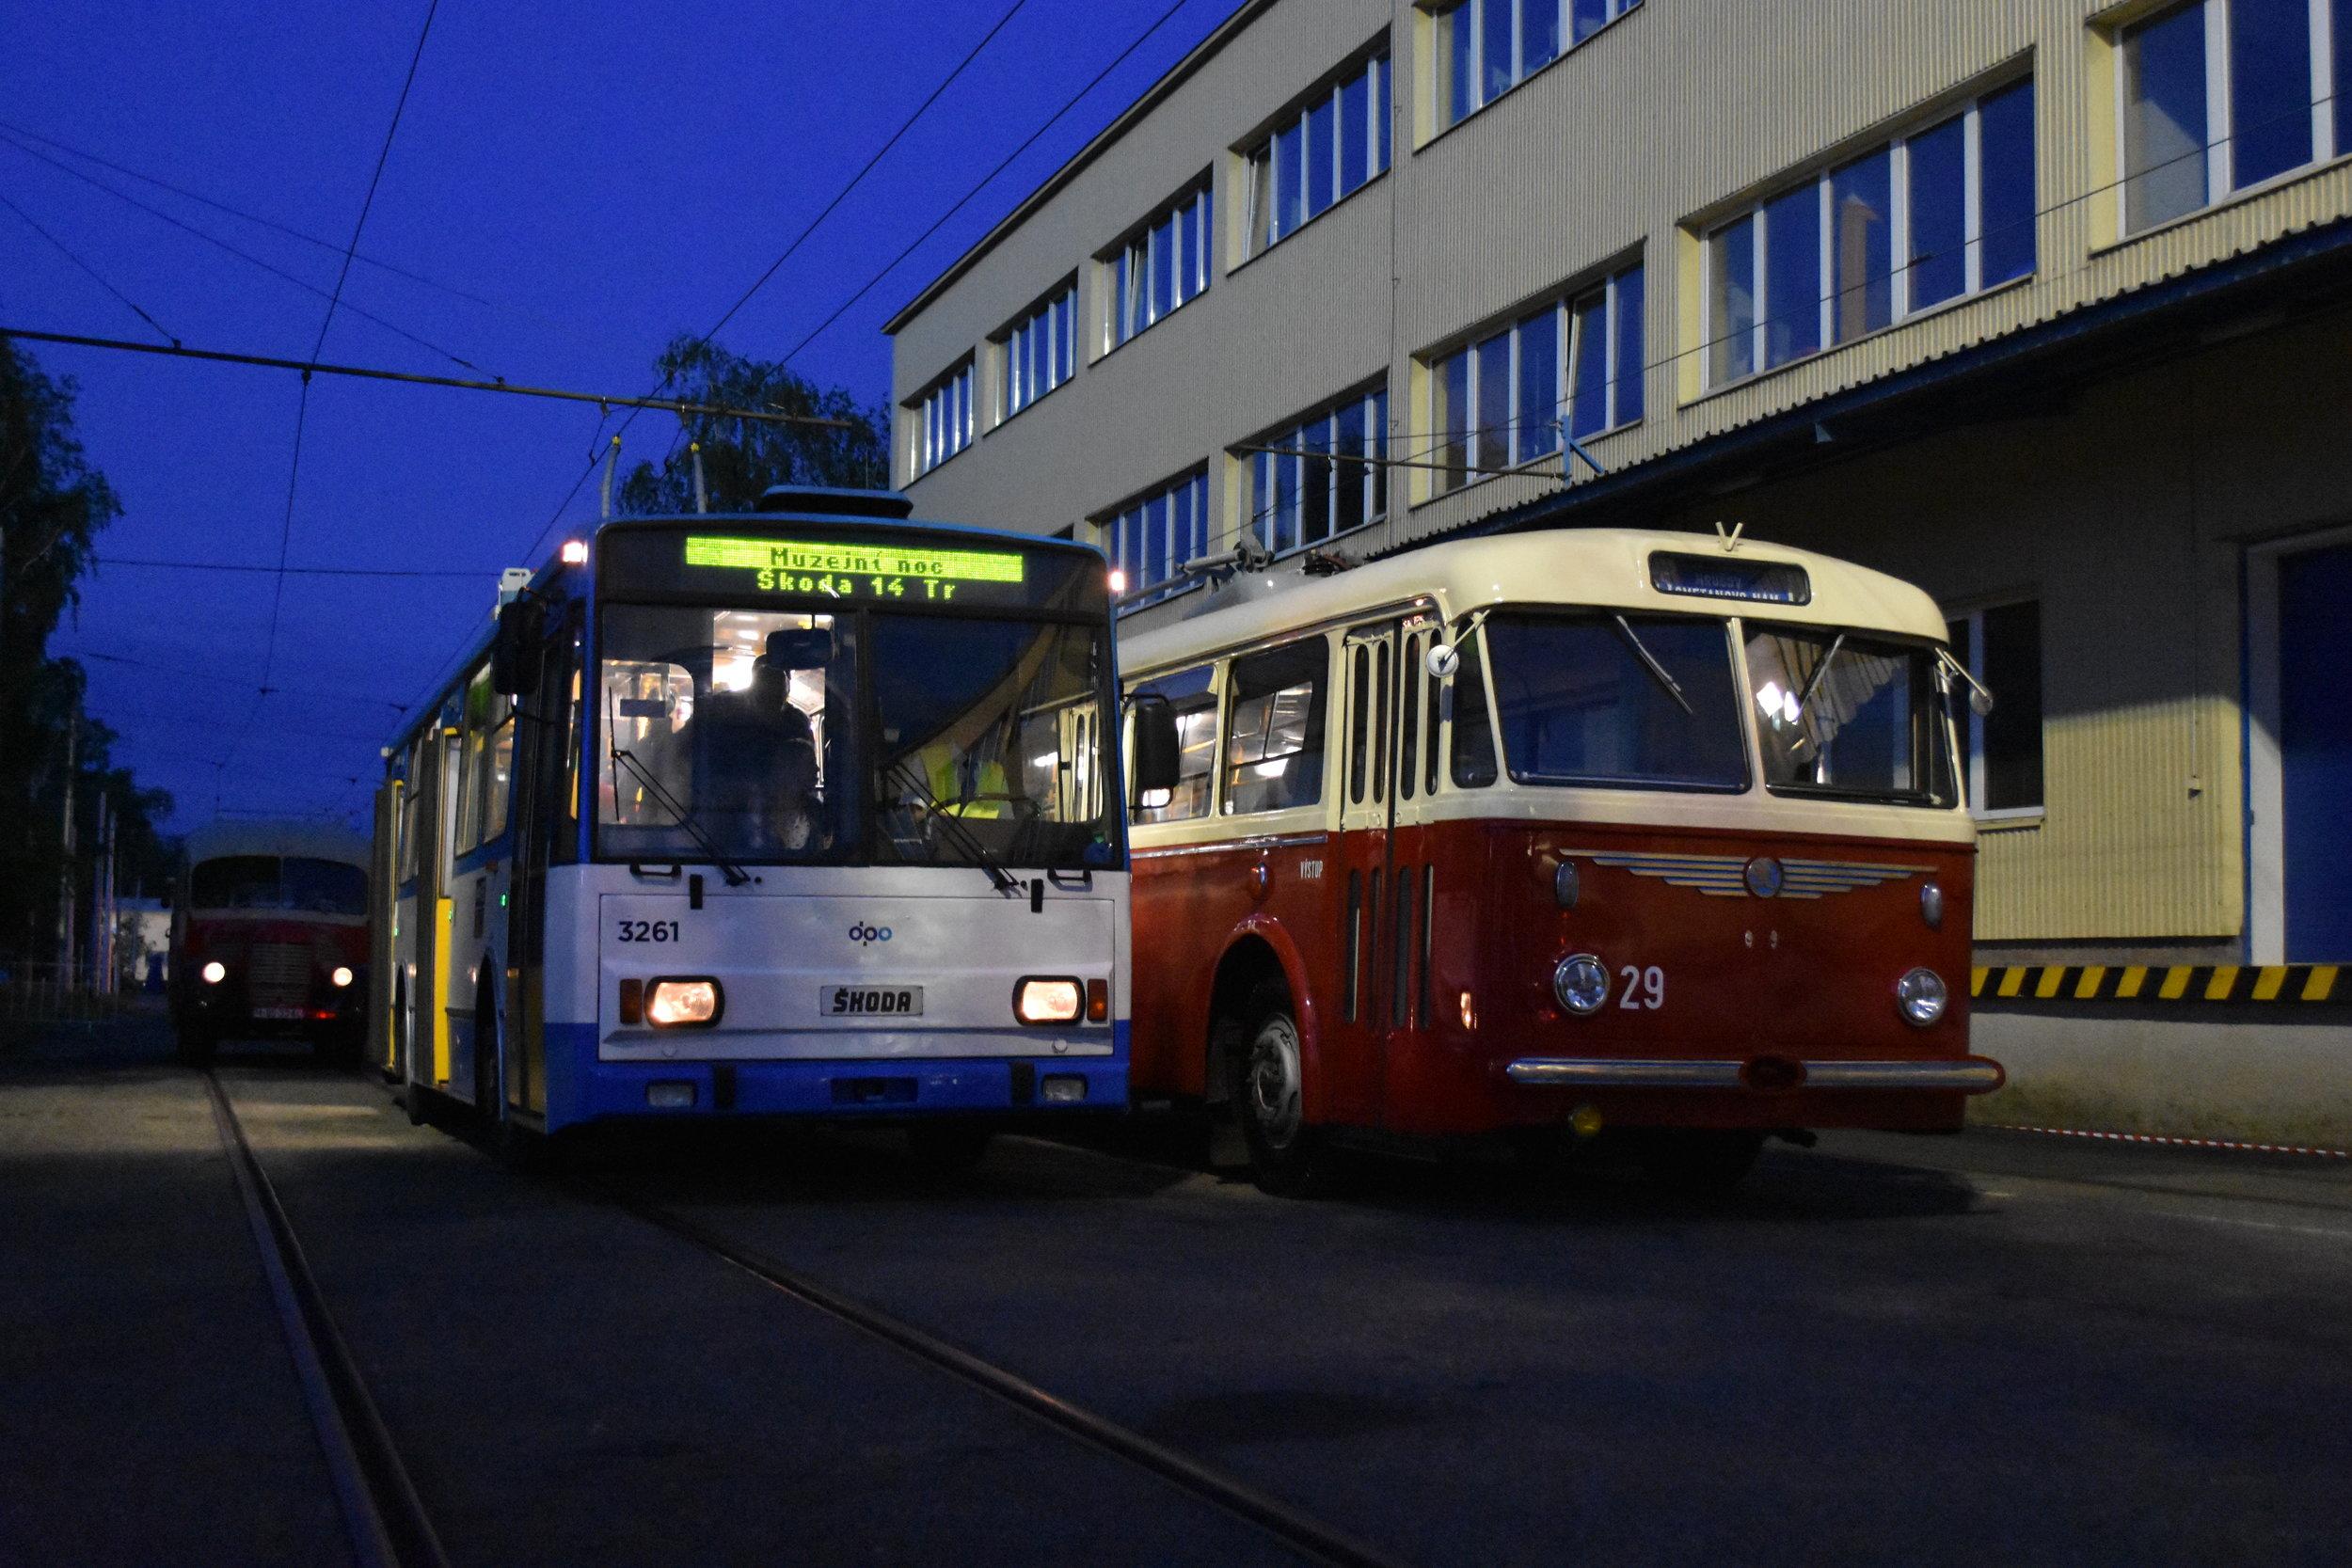 """Čtrnáctka"" se střídala na okružní trase s vozem Škoda 8 Tr ev. č. 29 (ex-Zlín, resp. Gottwaldov ev. č. 32). (foto: Libor Hinčica)"